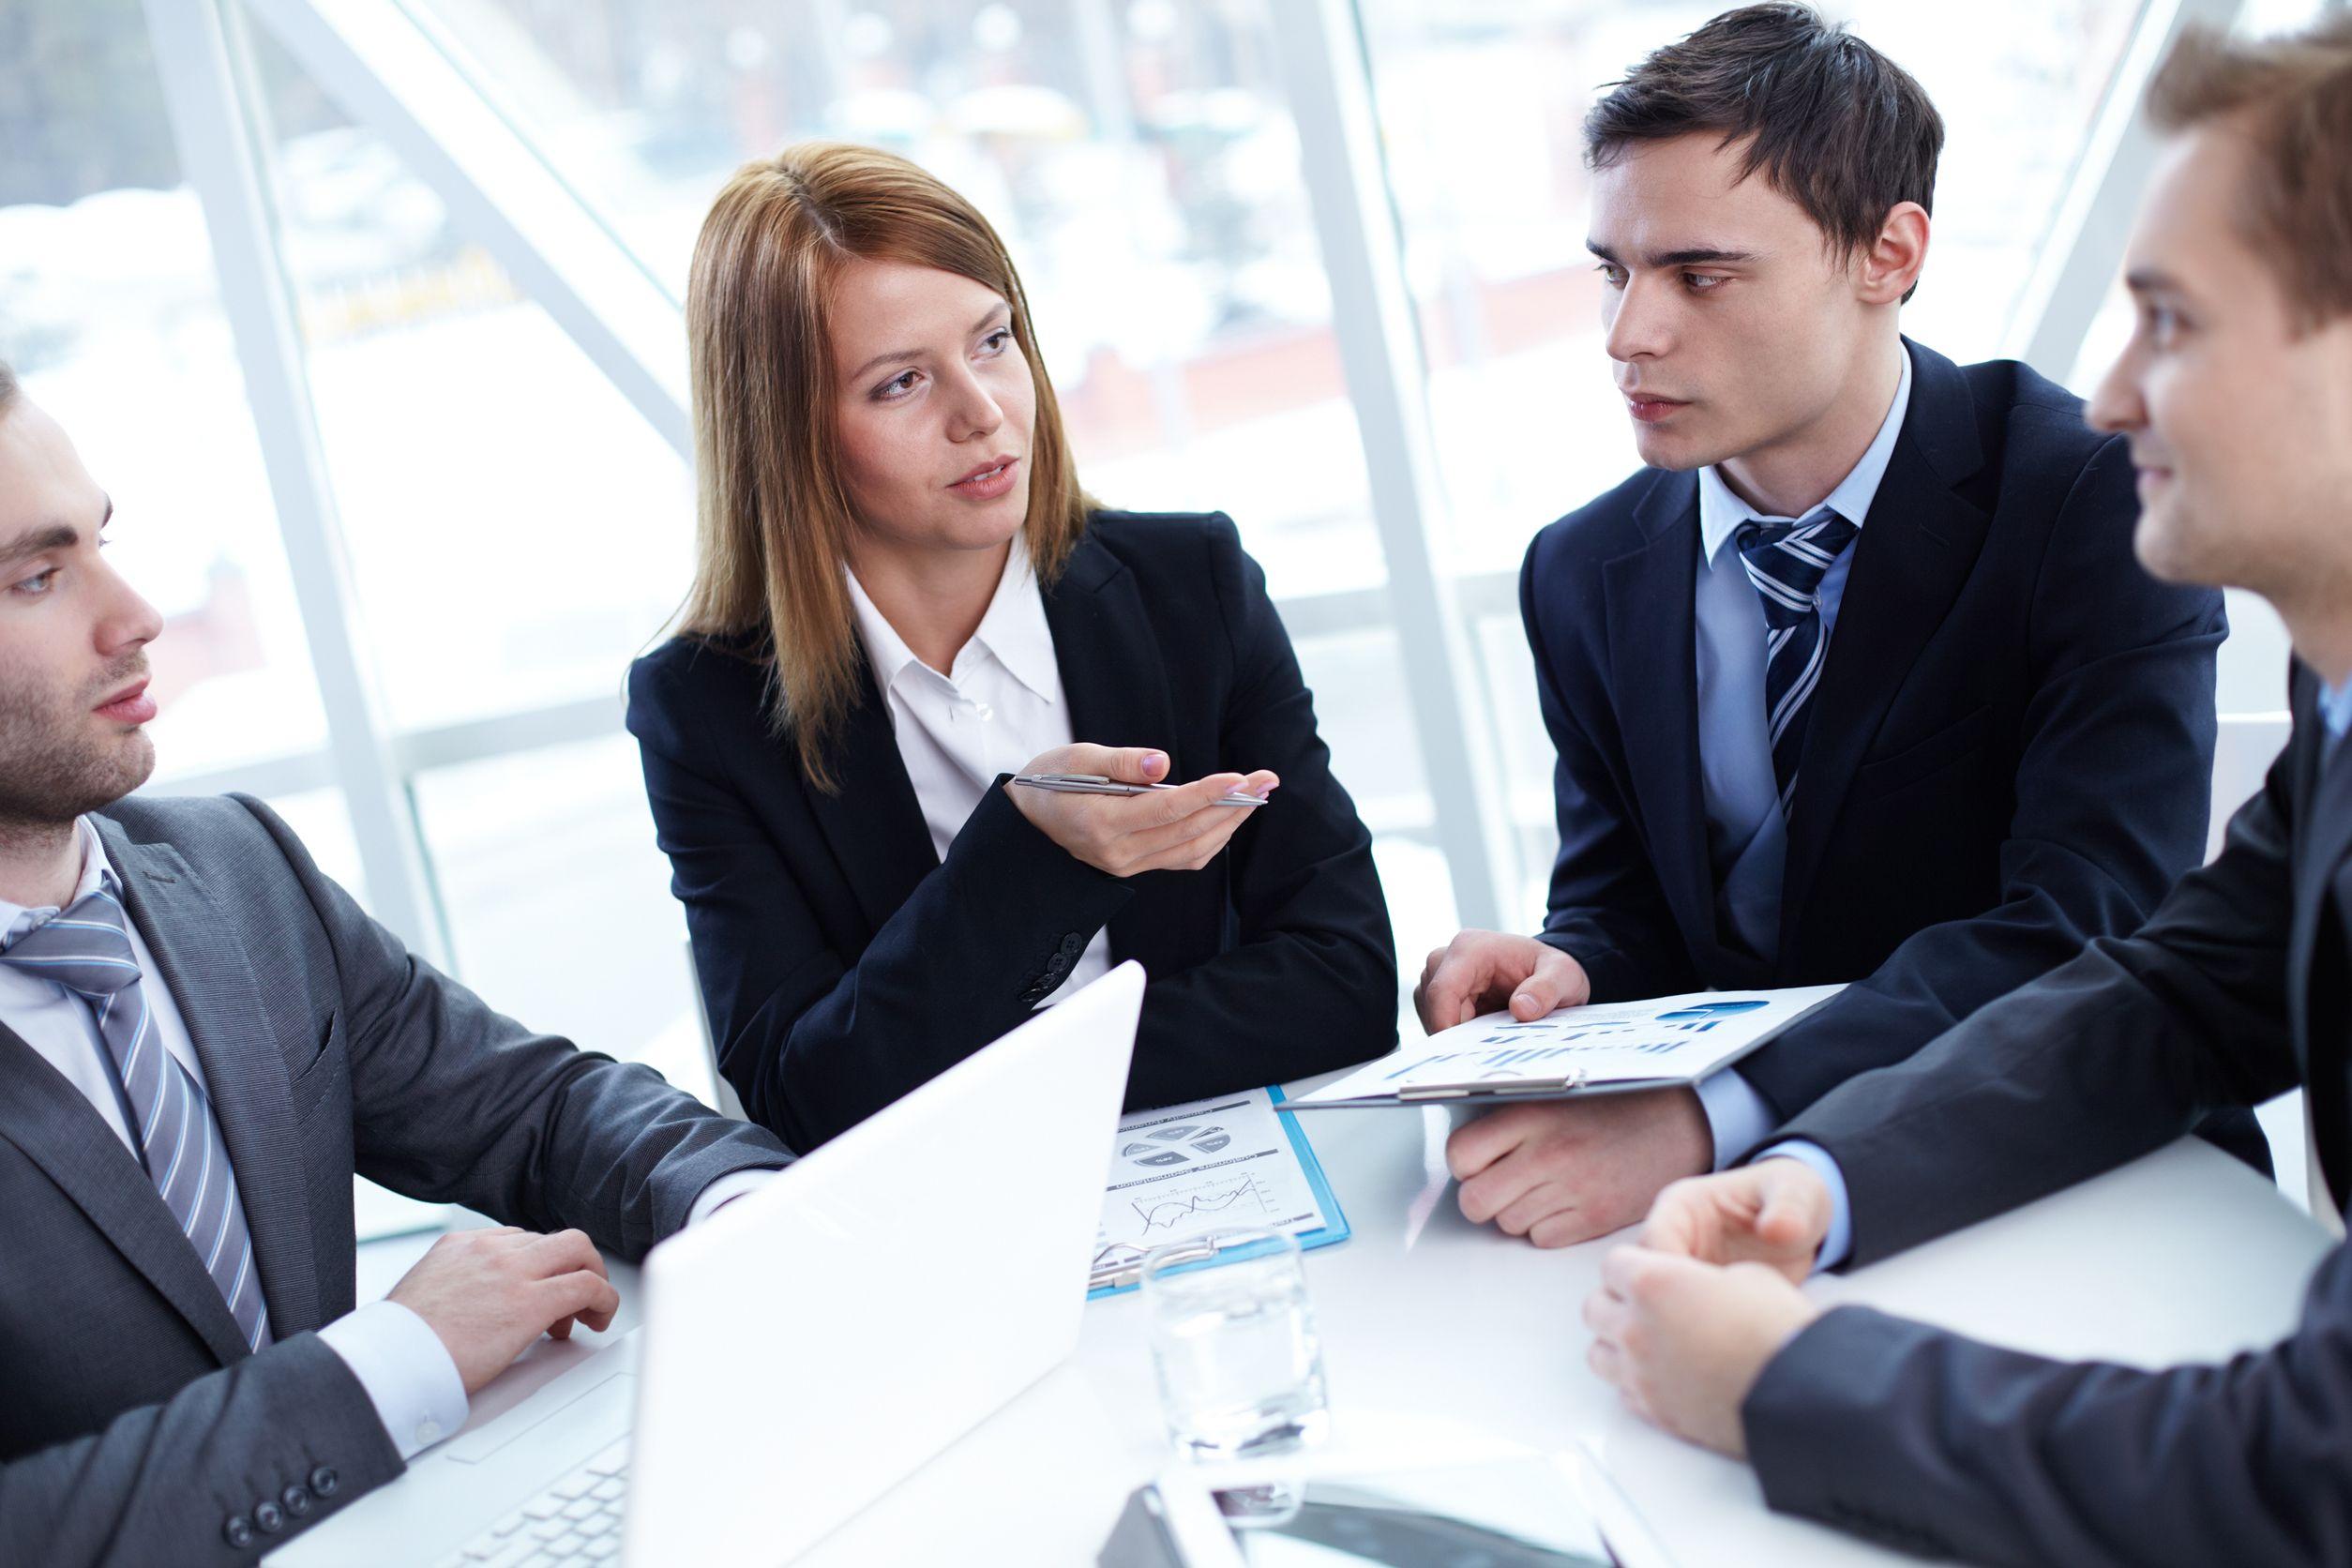 Score Points In Meetings